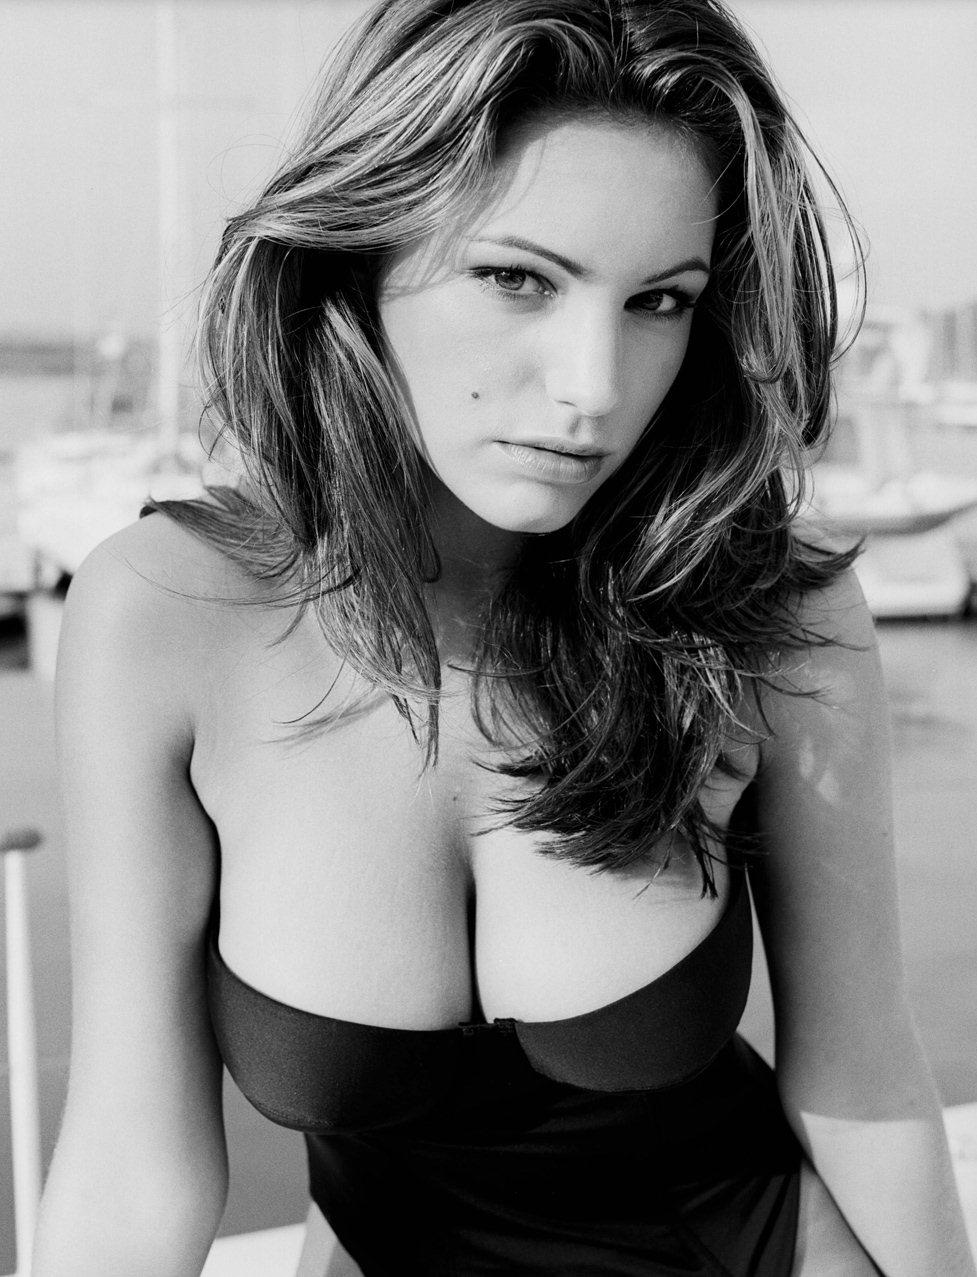 модель Келли Брук / Kelly Brook, фотограф Steve Perry